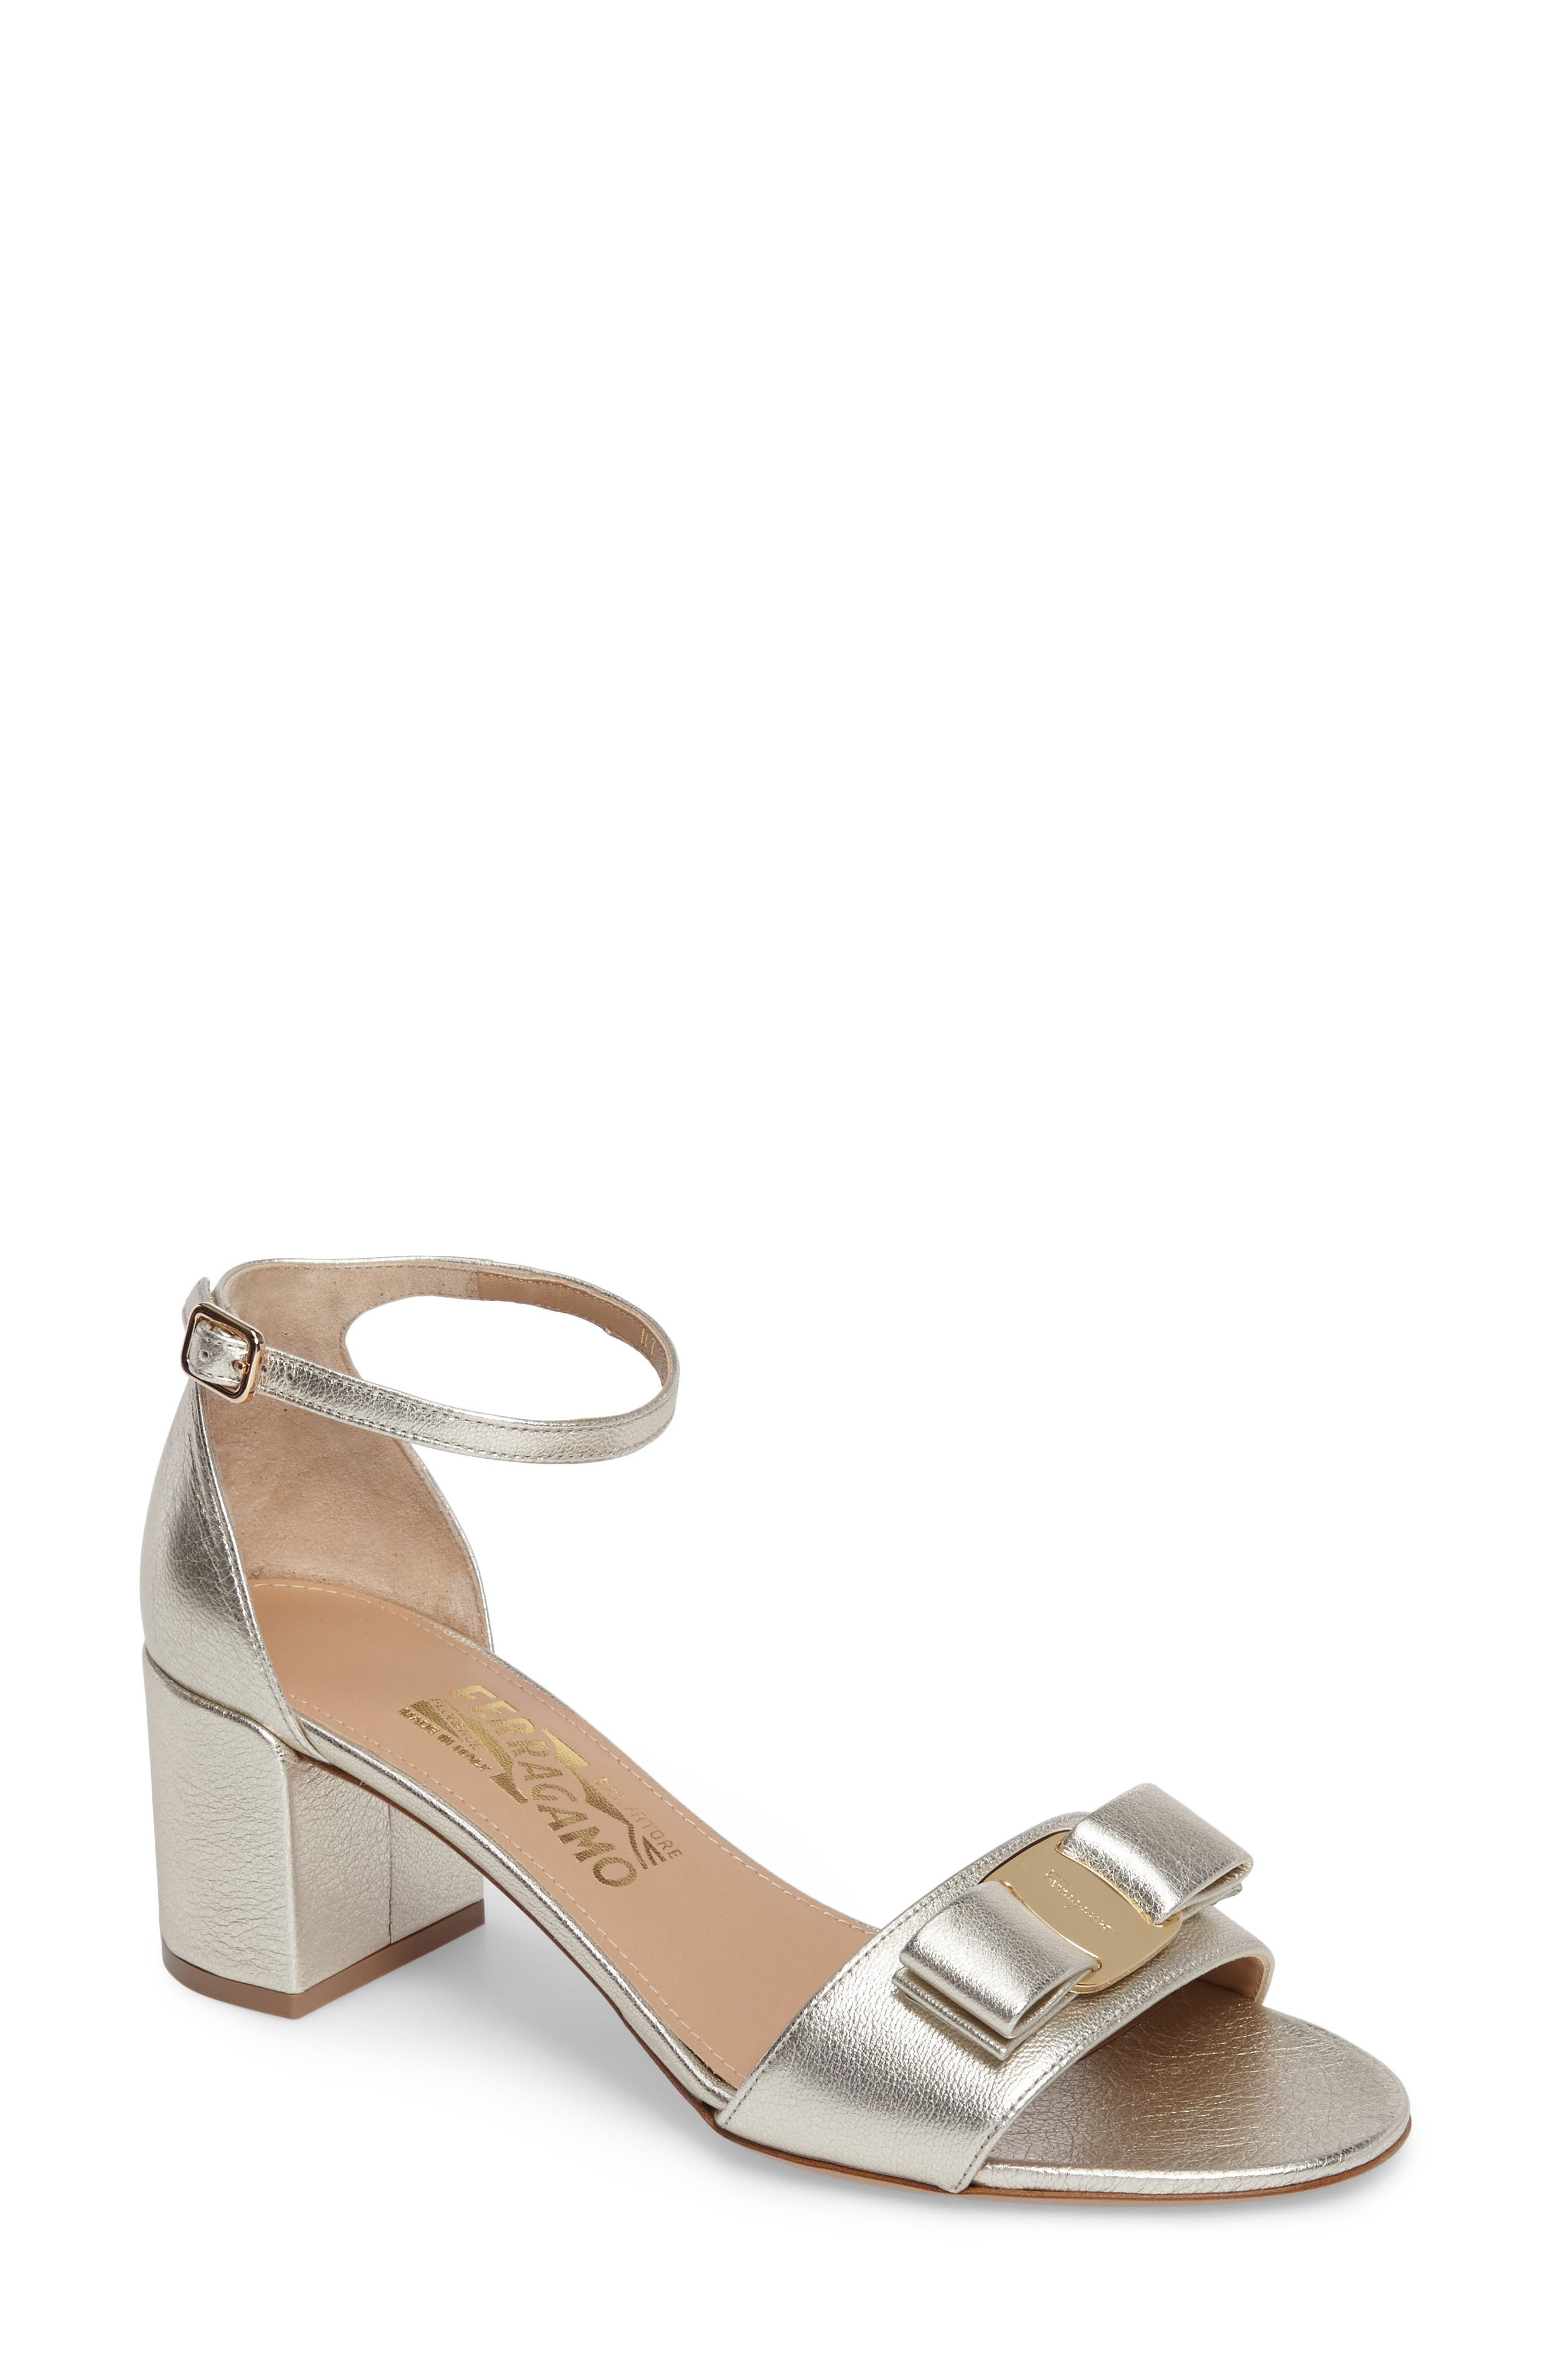 Alternate Image 1 Selected - Salvatore Ferragamo Block Heel Bow Sandal (Women)